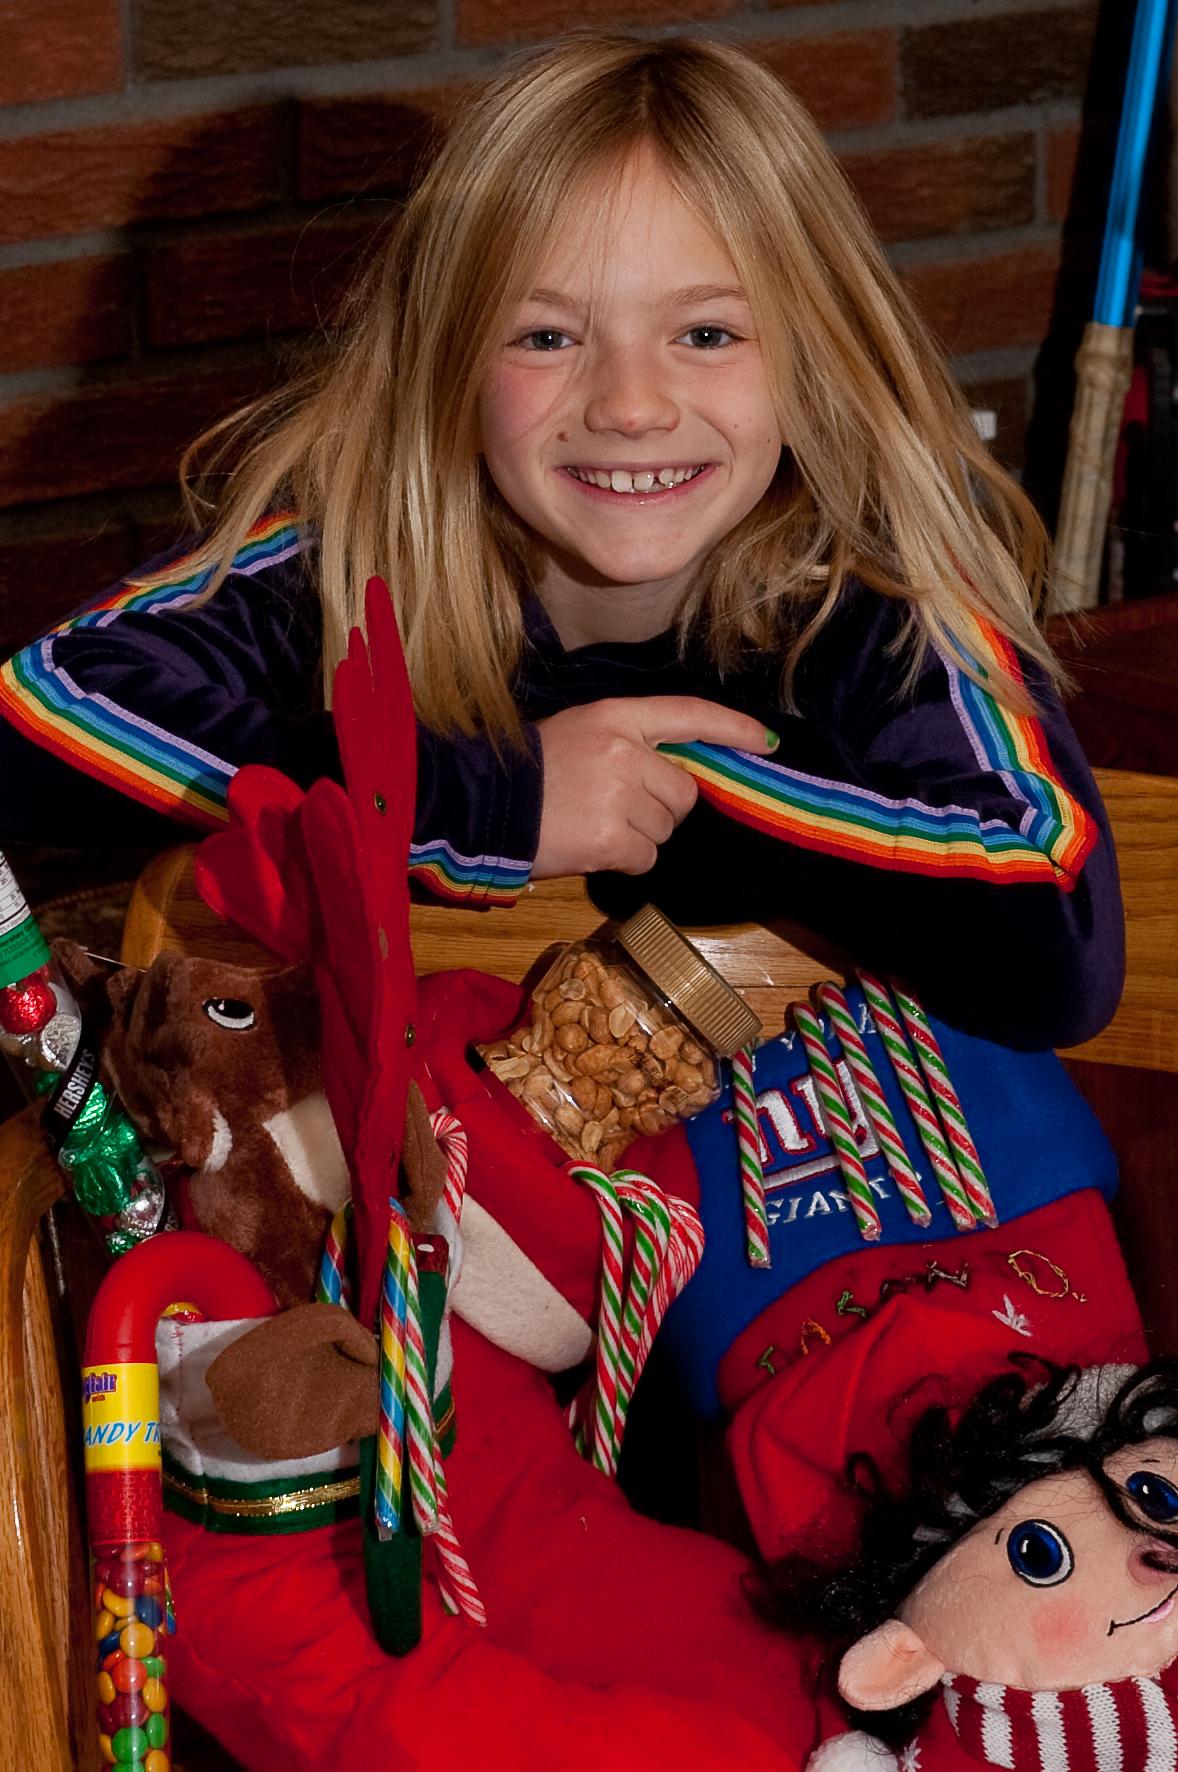 Anna D & Albany  Family Christmas 2009 (4 of 24)